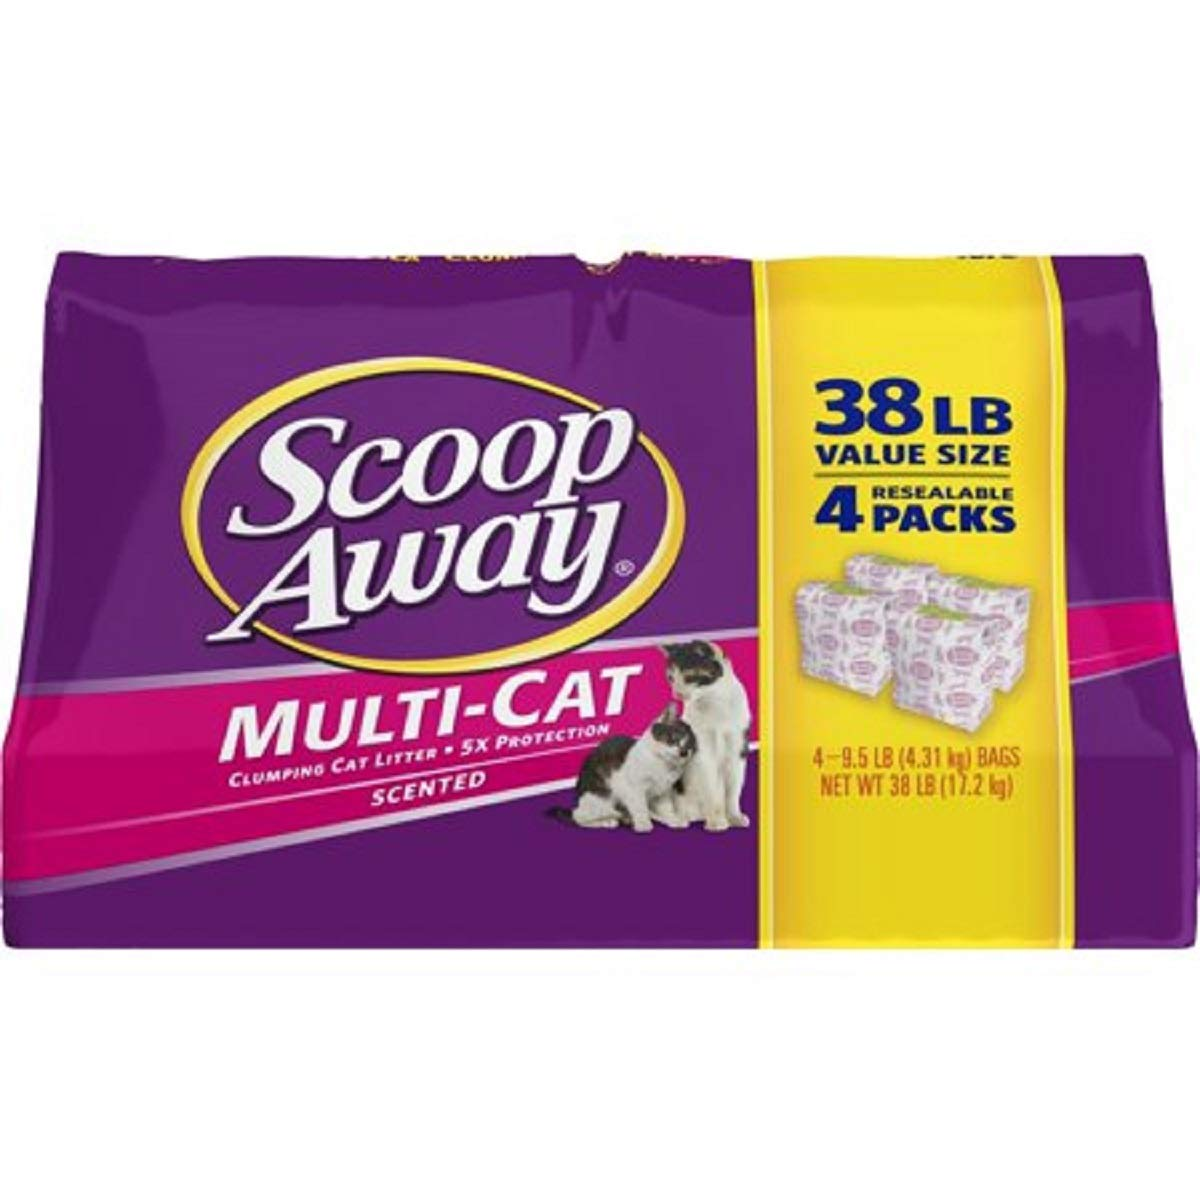 Amazon.com : Scoop Away Multi-Cat, Scented Cat Litter, 25 Pound Carton (4Packs) : Pet Supplies